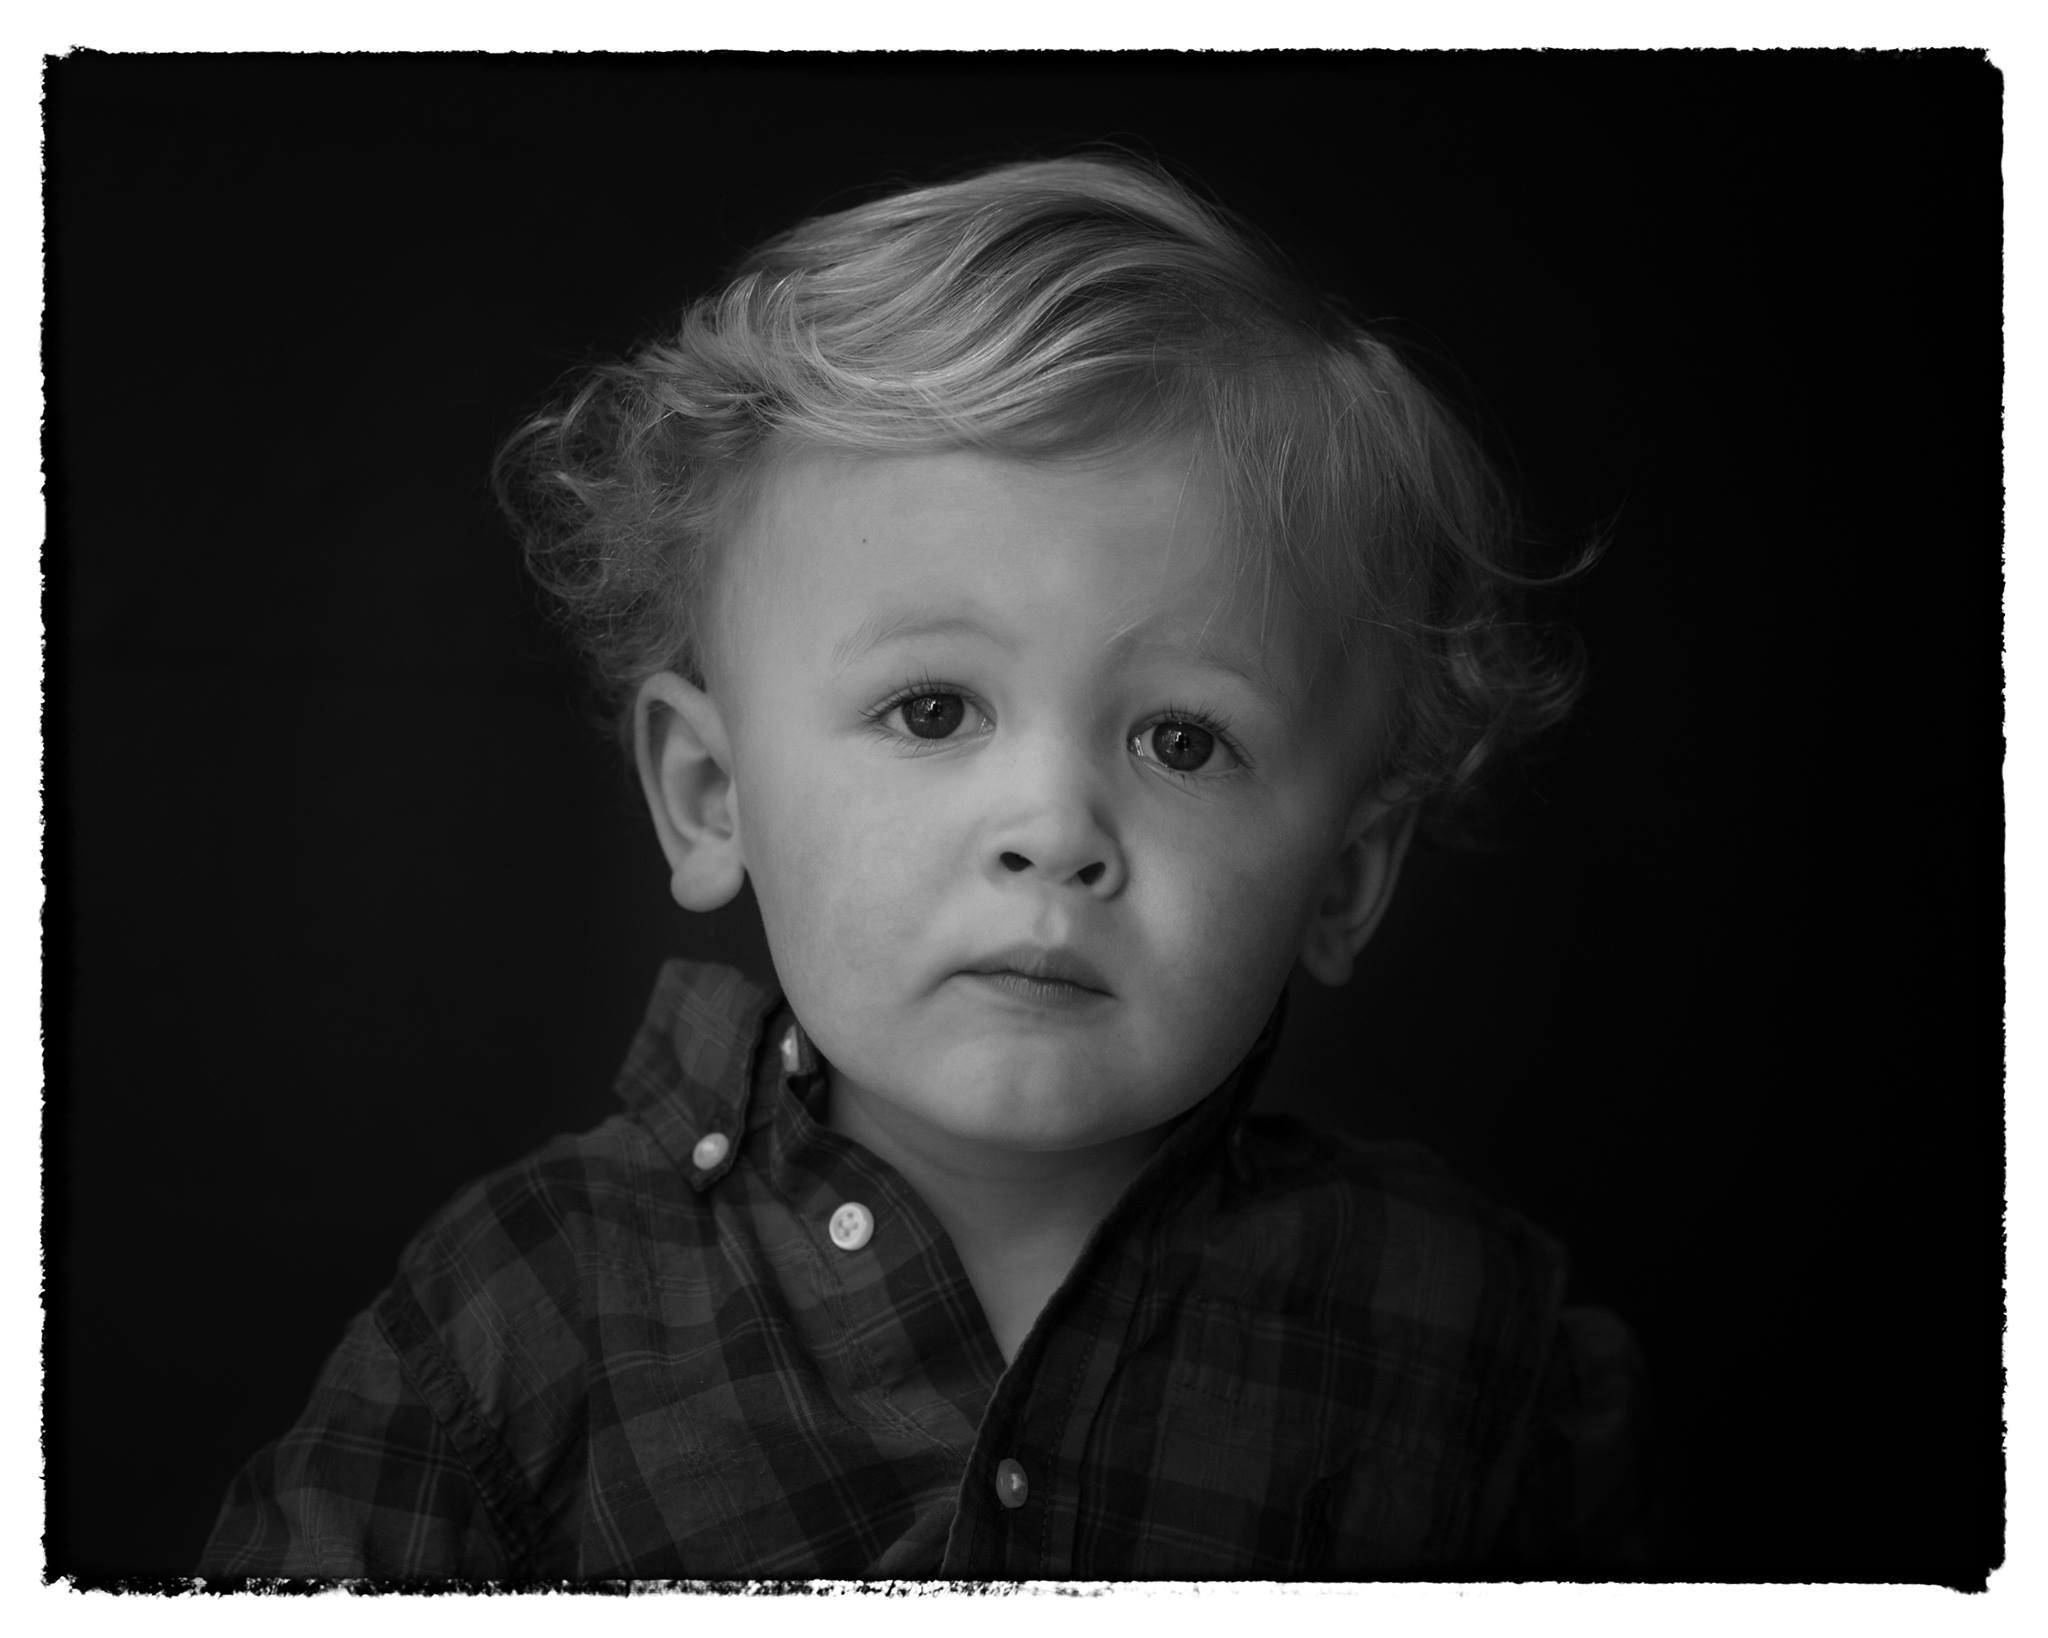 schooled online course fine art black and white child portrait photography kristen vallejo